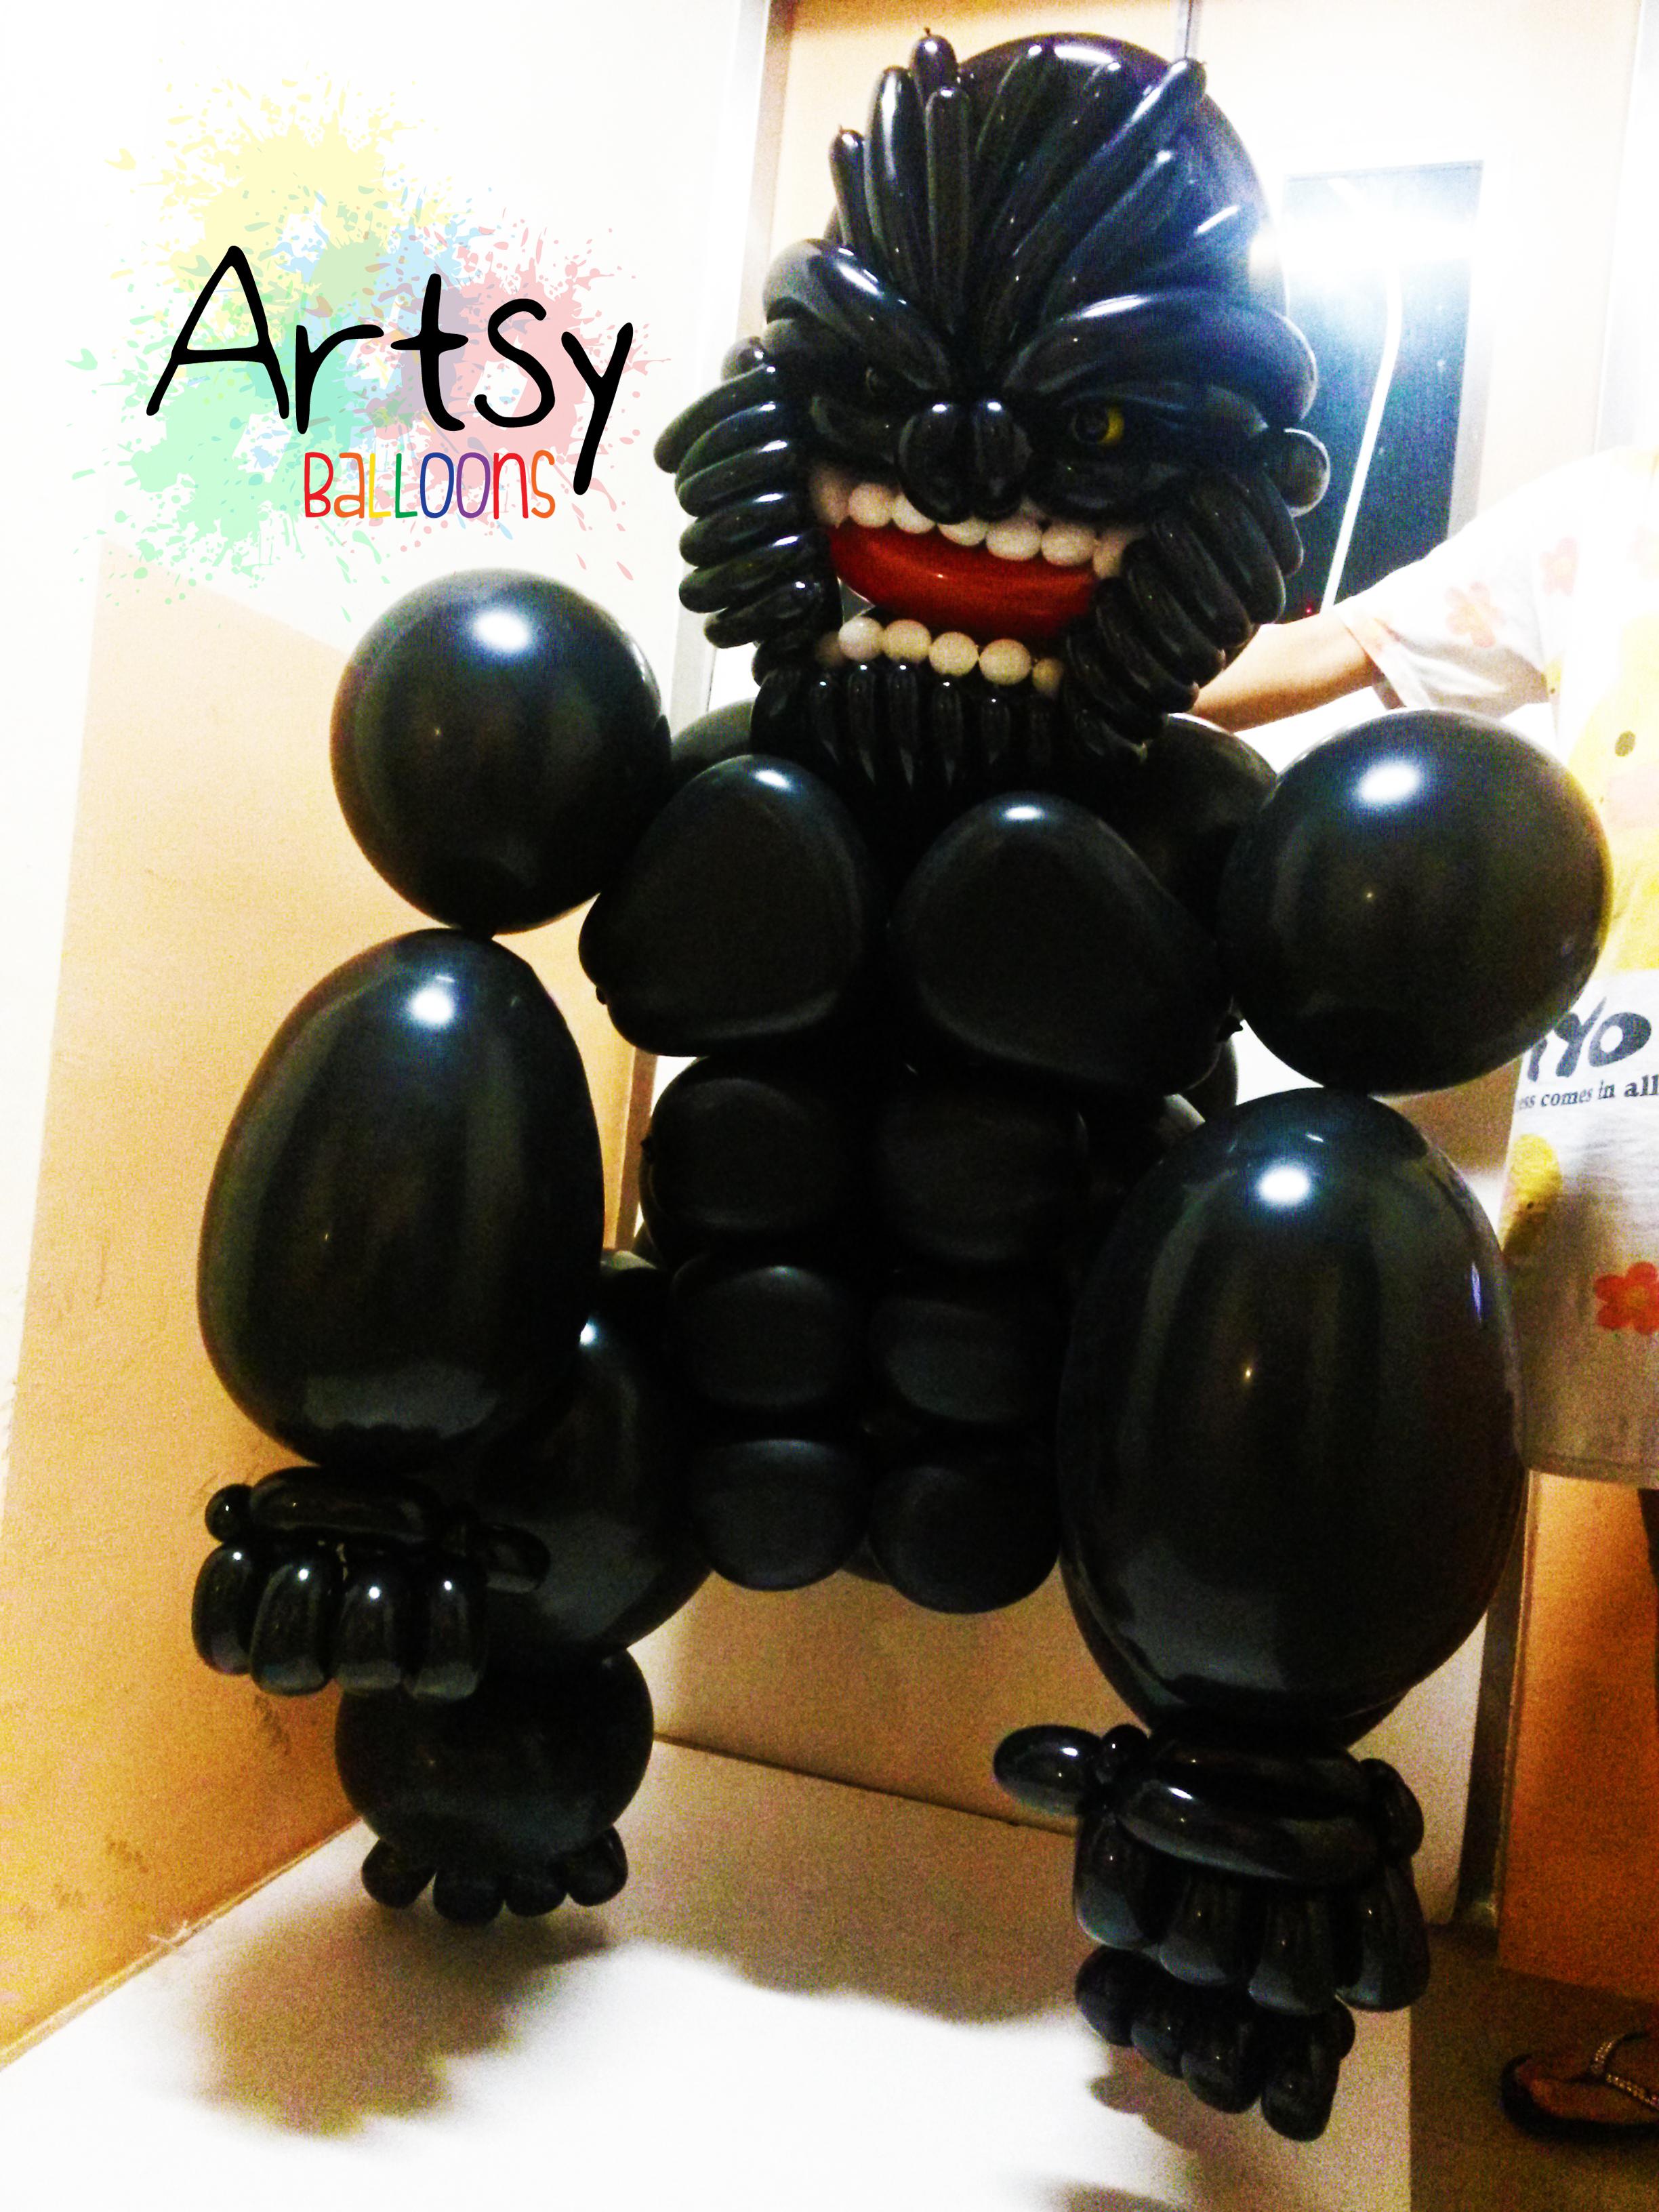 , Live Size King Kong Balloon Sculpture, Singapore Balloon Decoration Services - Balloon Workshop and Balloon Sculpting